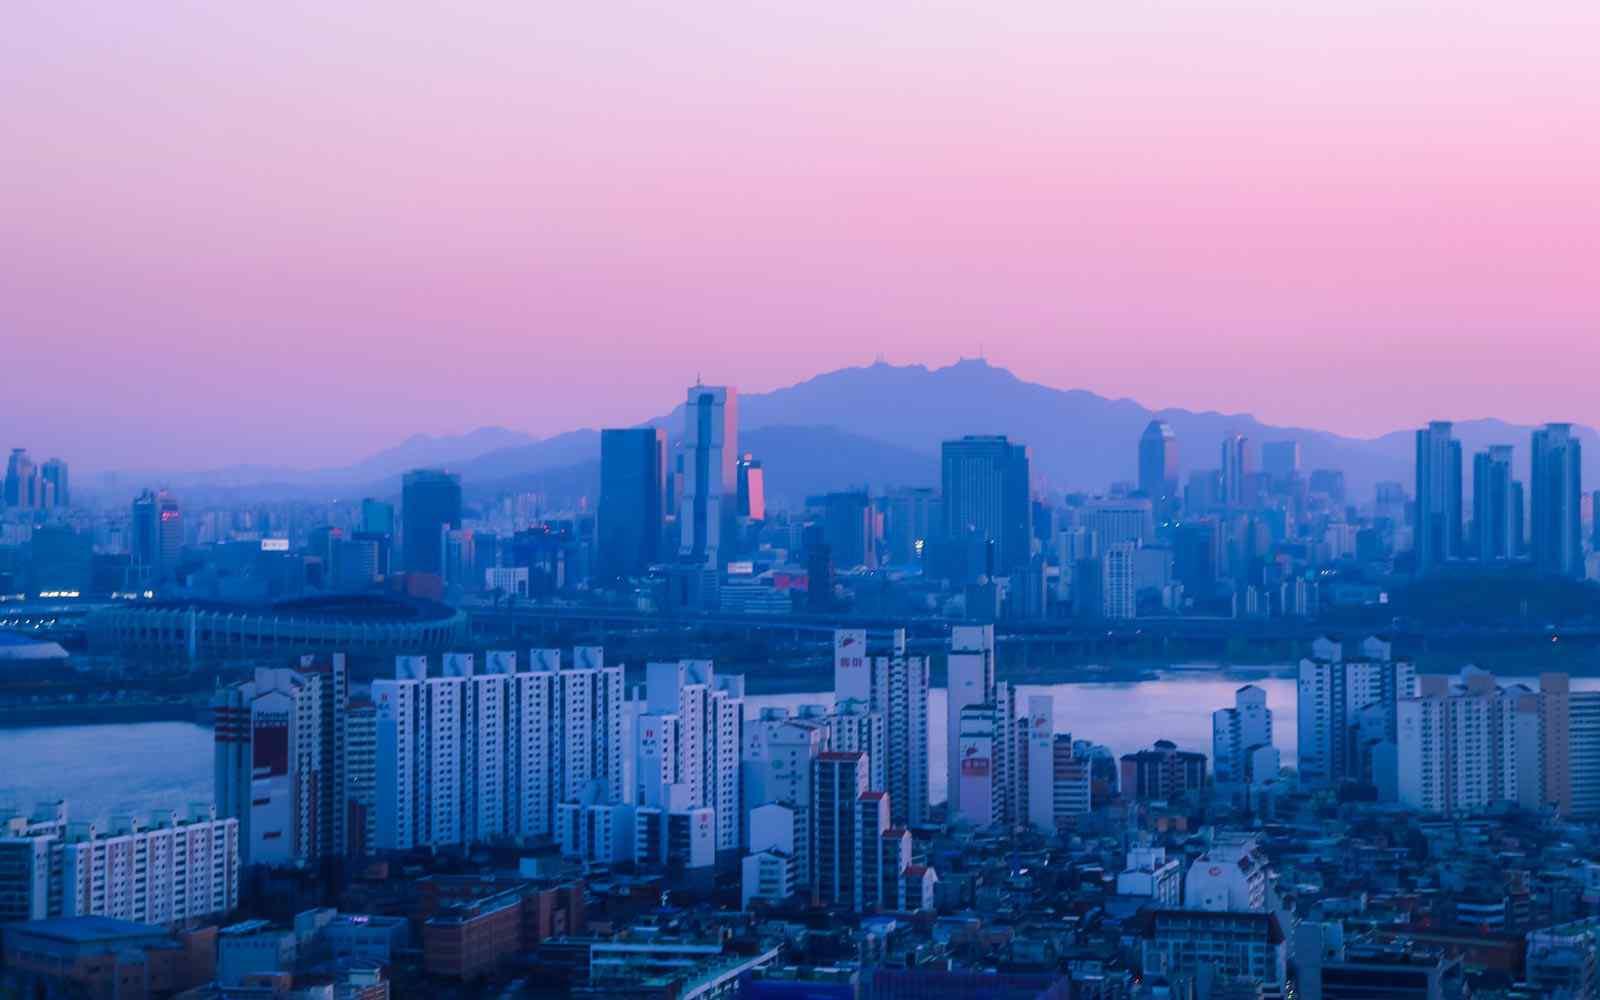 Skyline of Seoul Korea